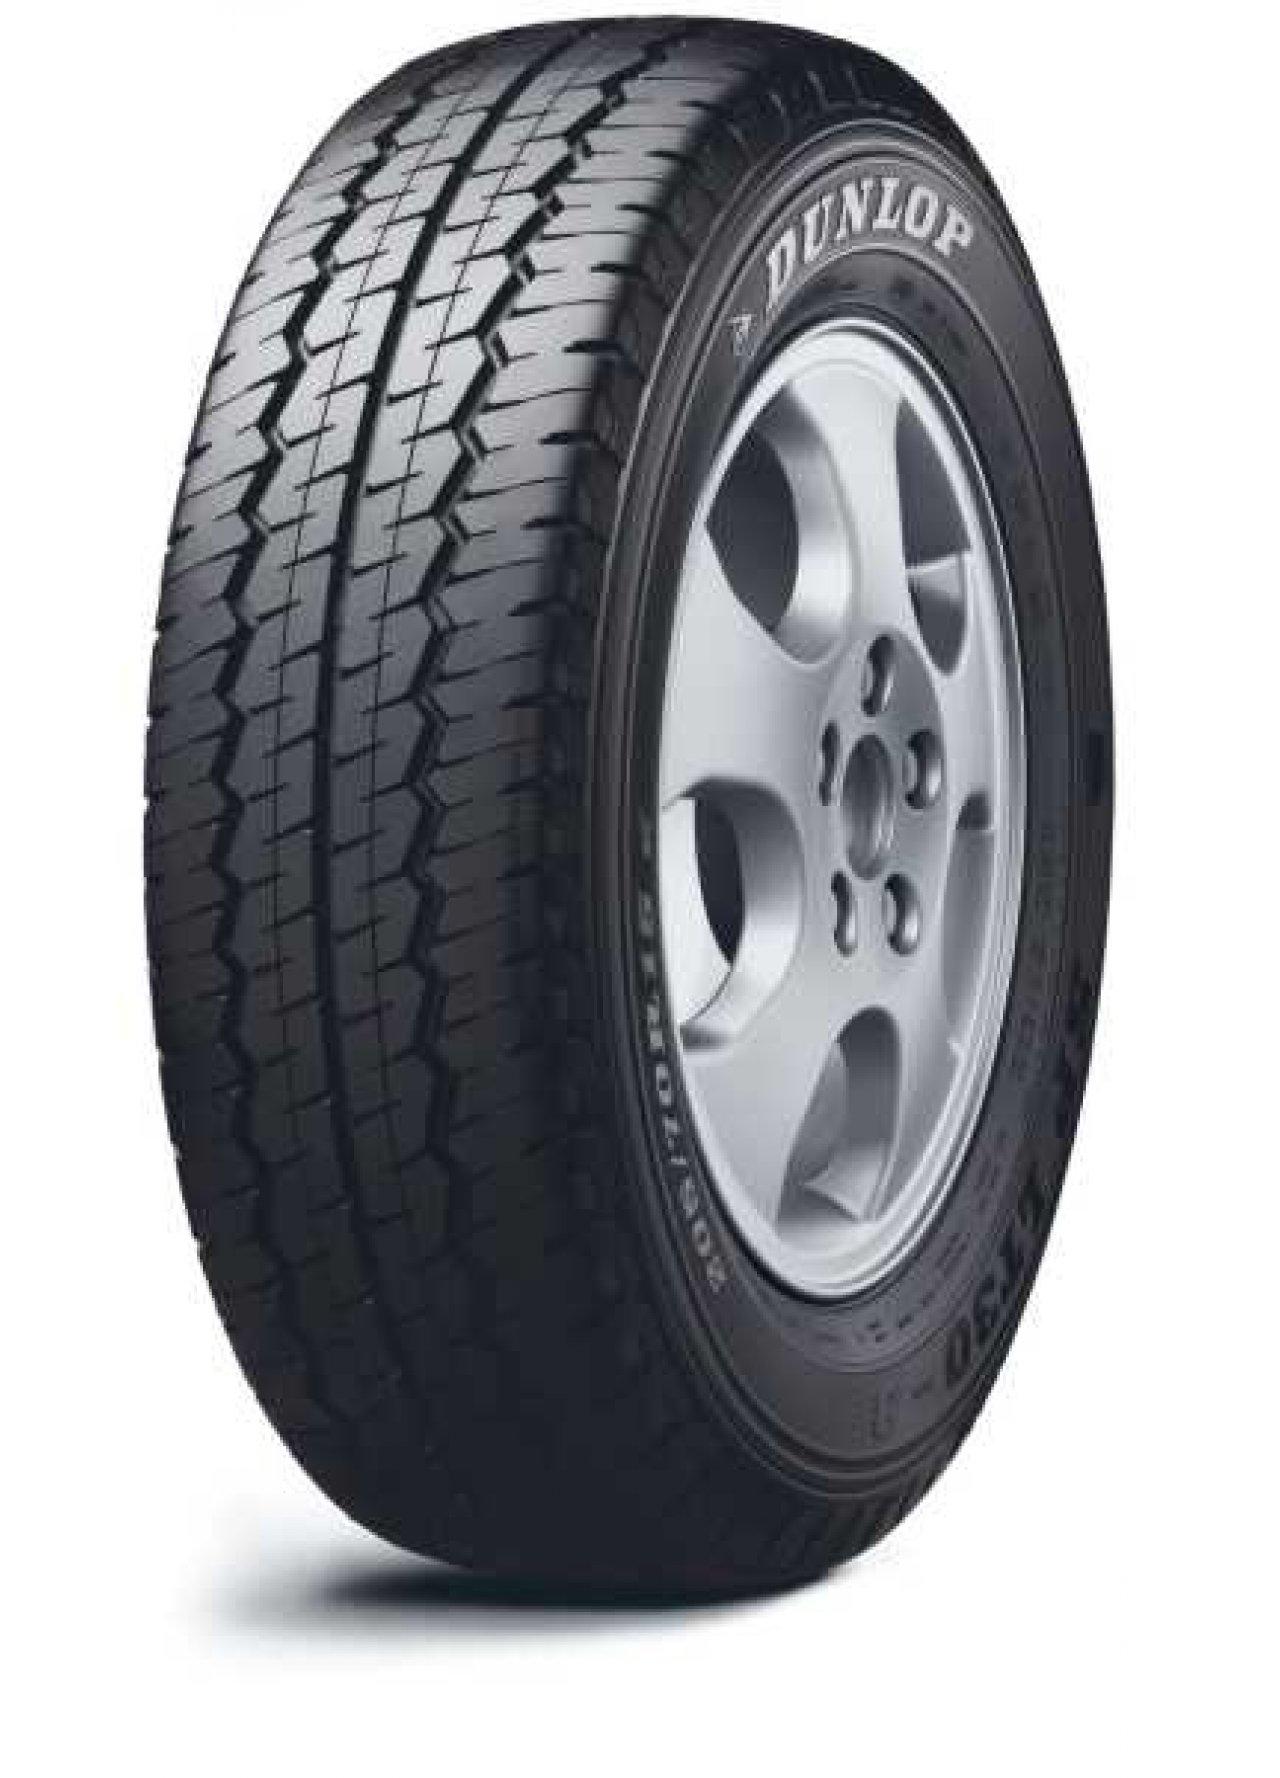 Anvelopa Dunlop Sport LT30 205/65R16C 107/105T